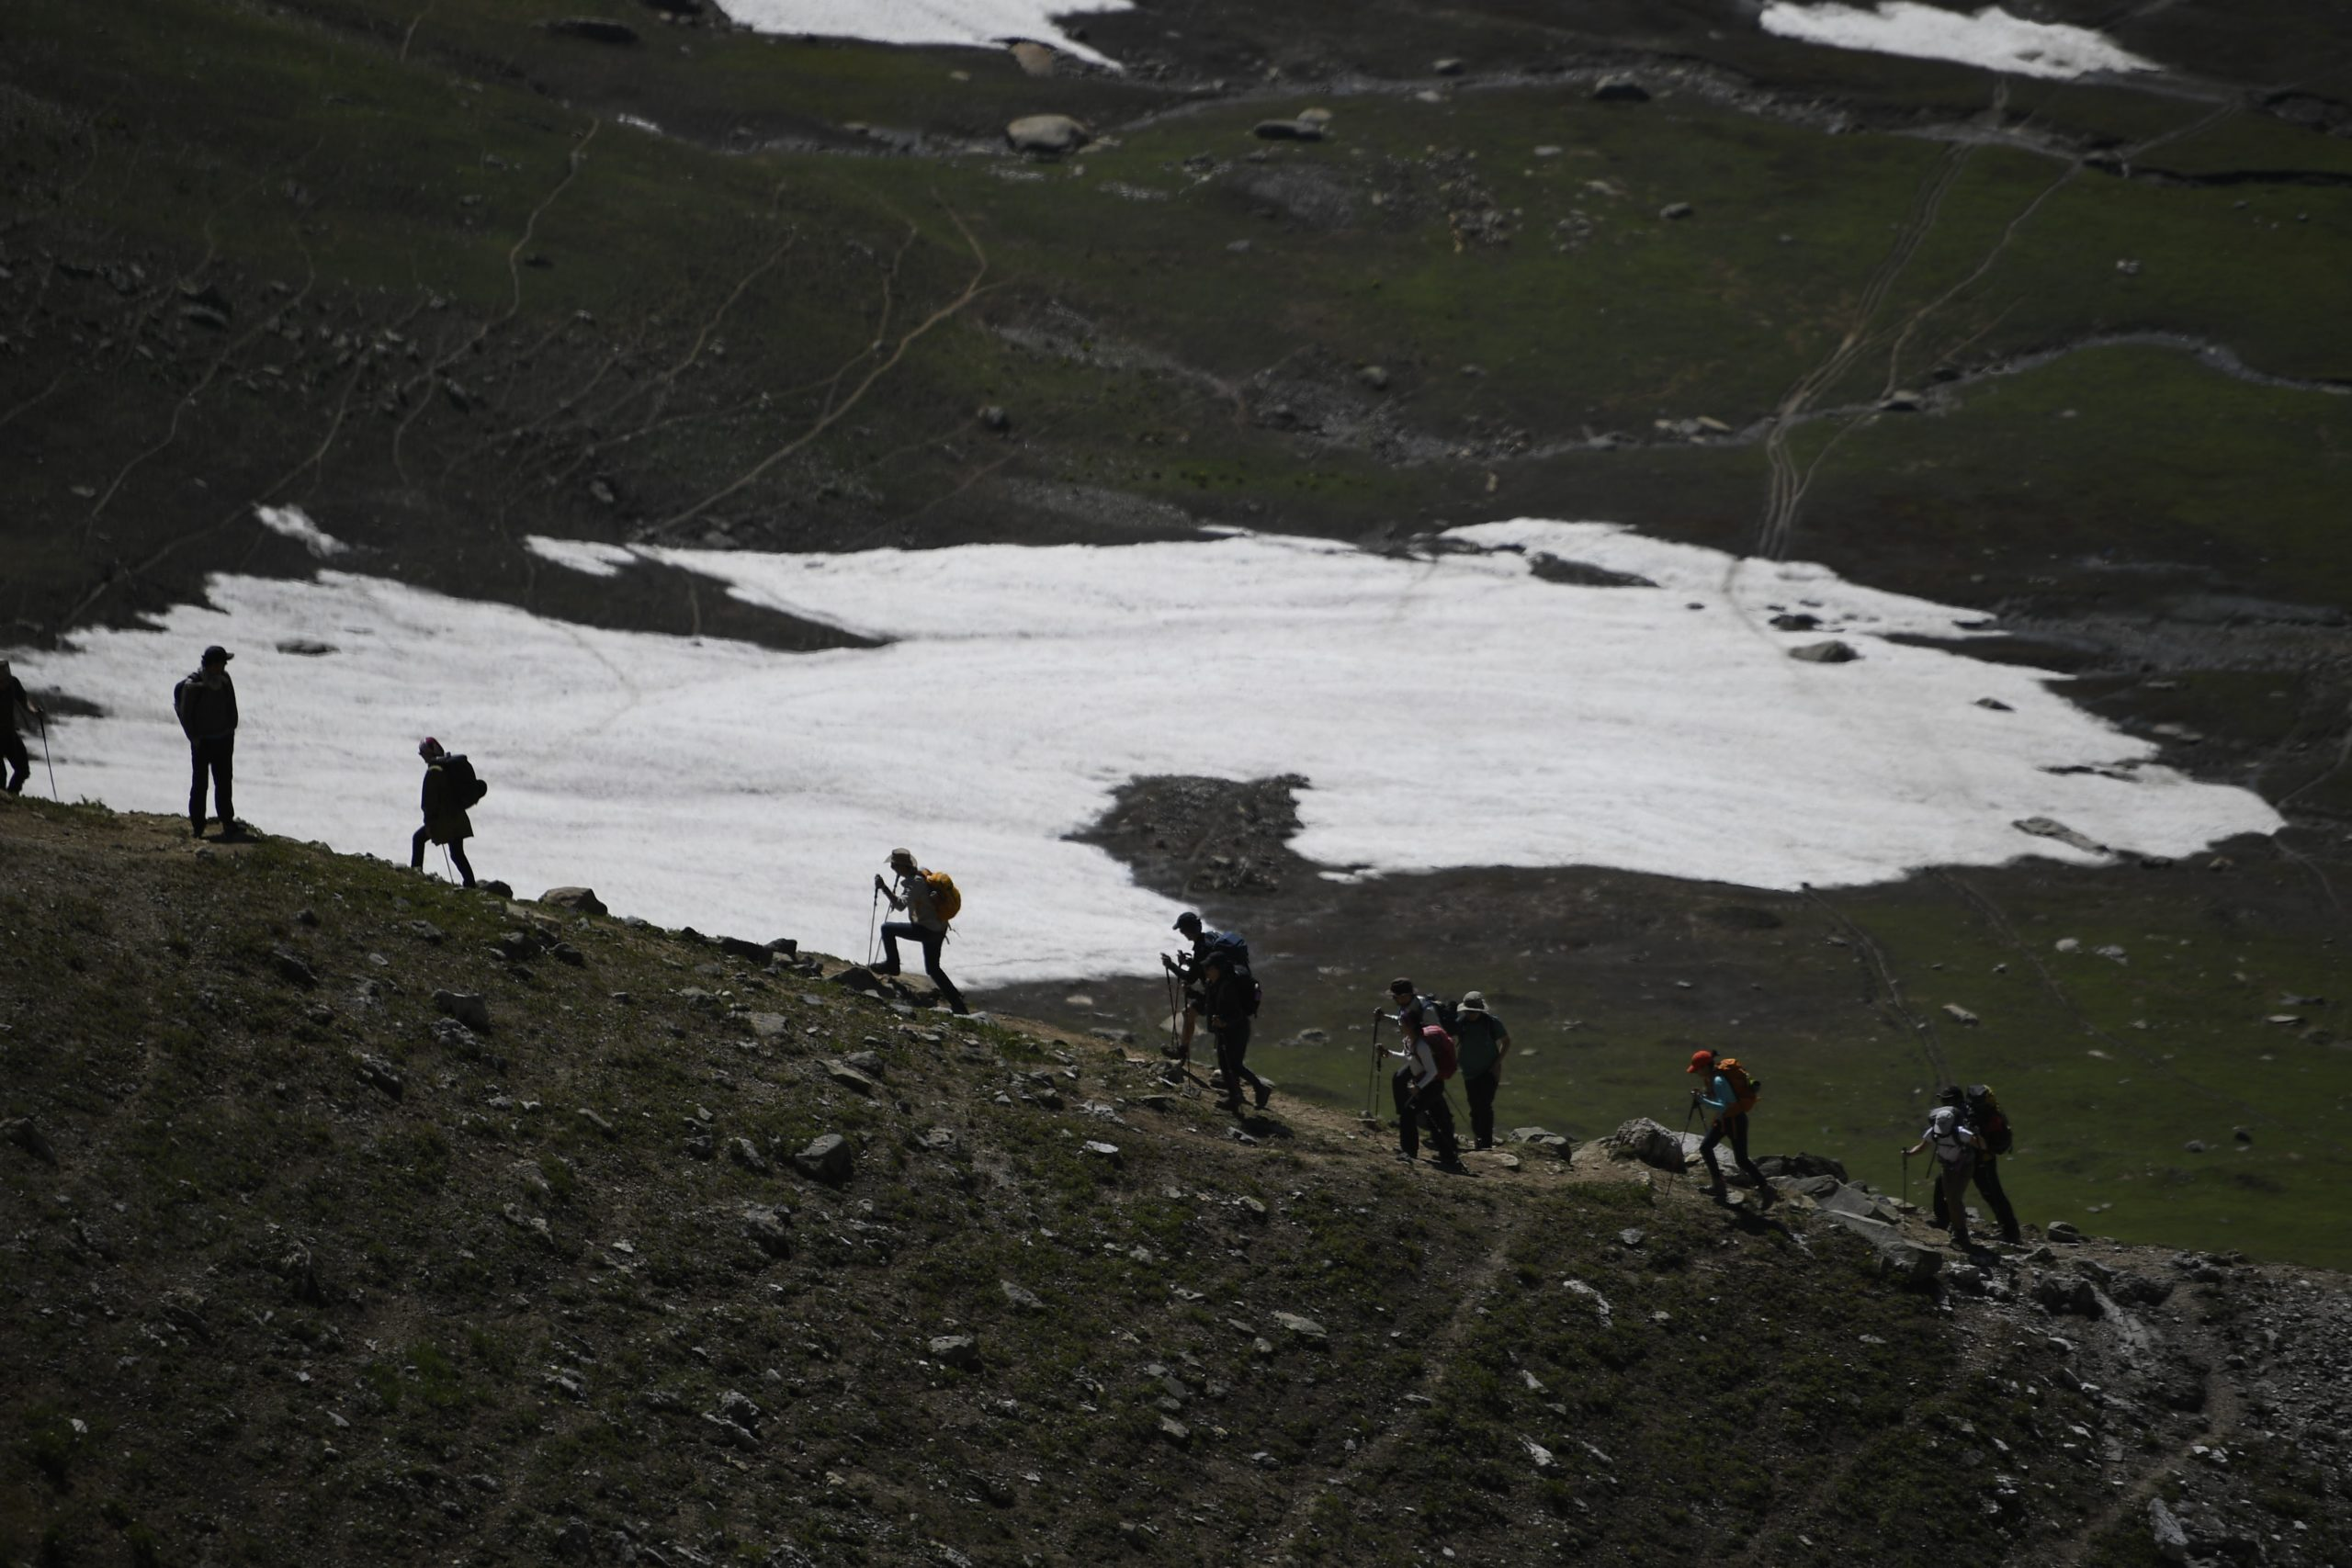 Pantila Debhakam best adventure trips: An adventure trip in Kashmir, India.